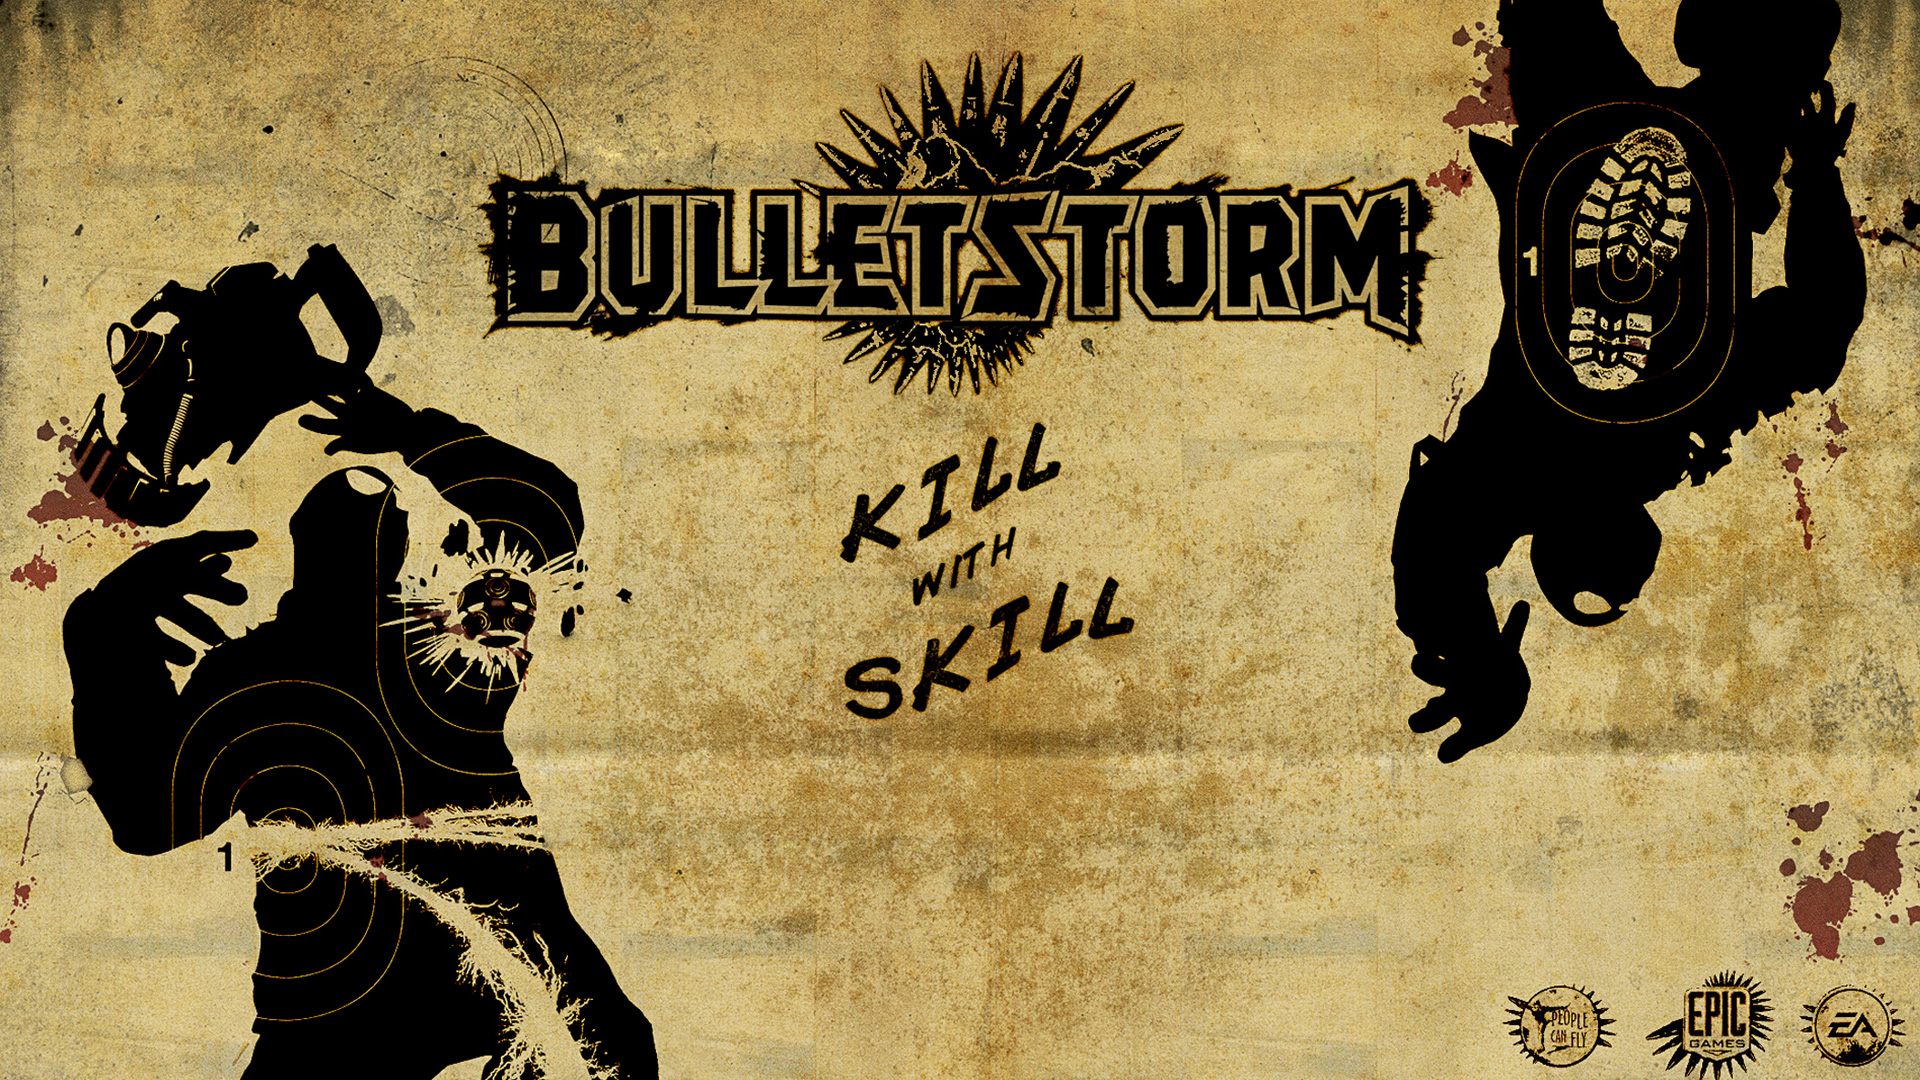 Bulletstorm Wallpaper in 1920x1080